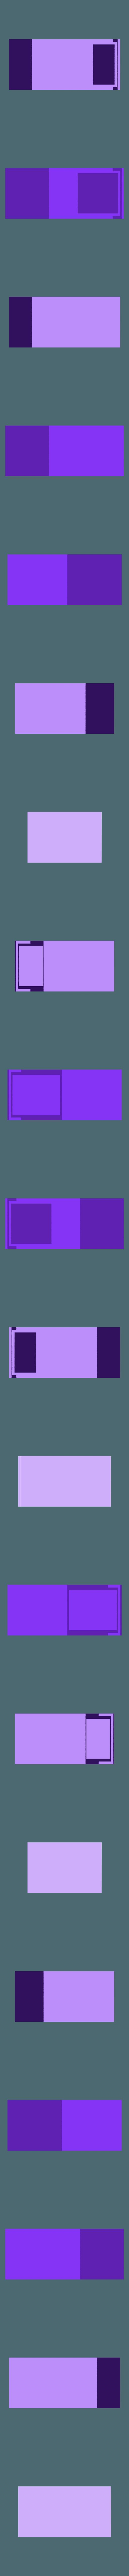 bushing_organizer_box.stl Download free STL file pen bushing organizer • 3D printer object, drykill_23